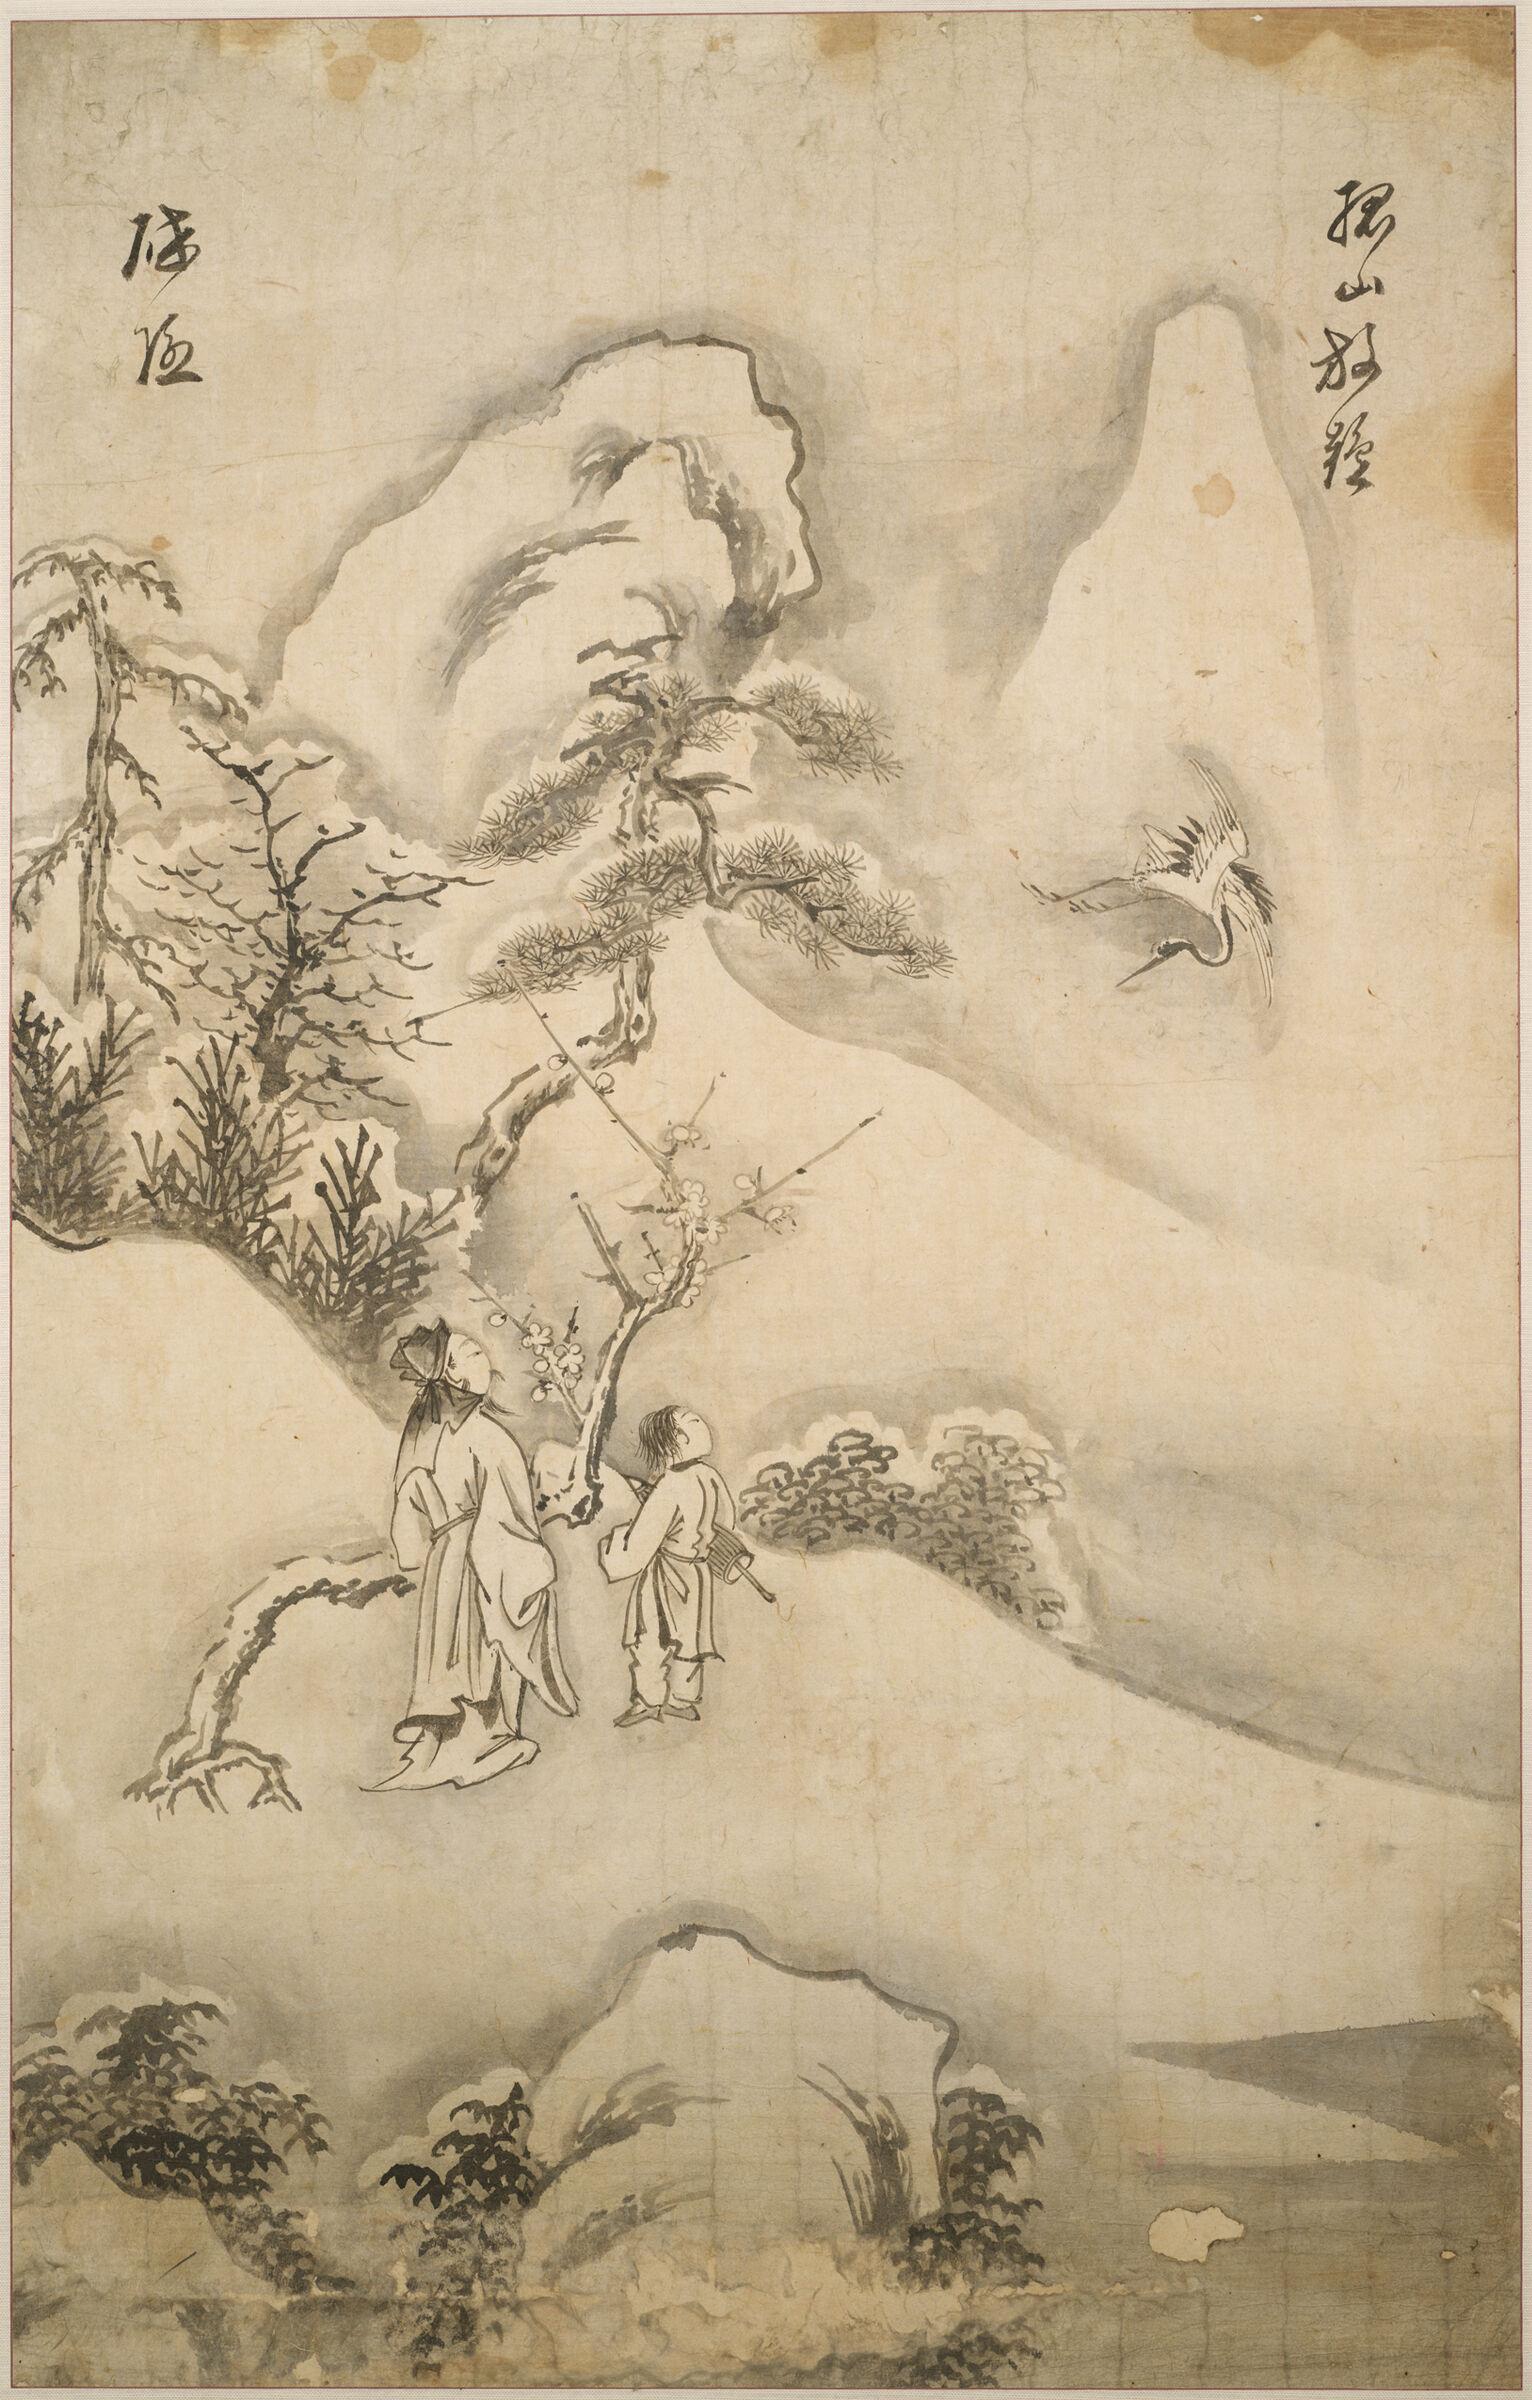 The Recluse Lin Bu (967-1028) Releasing Cranes At Mount Gu